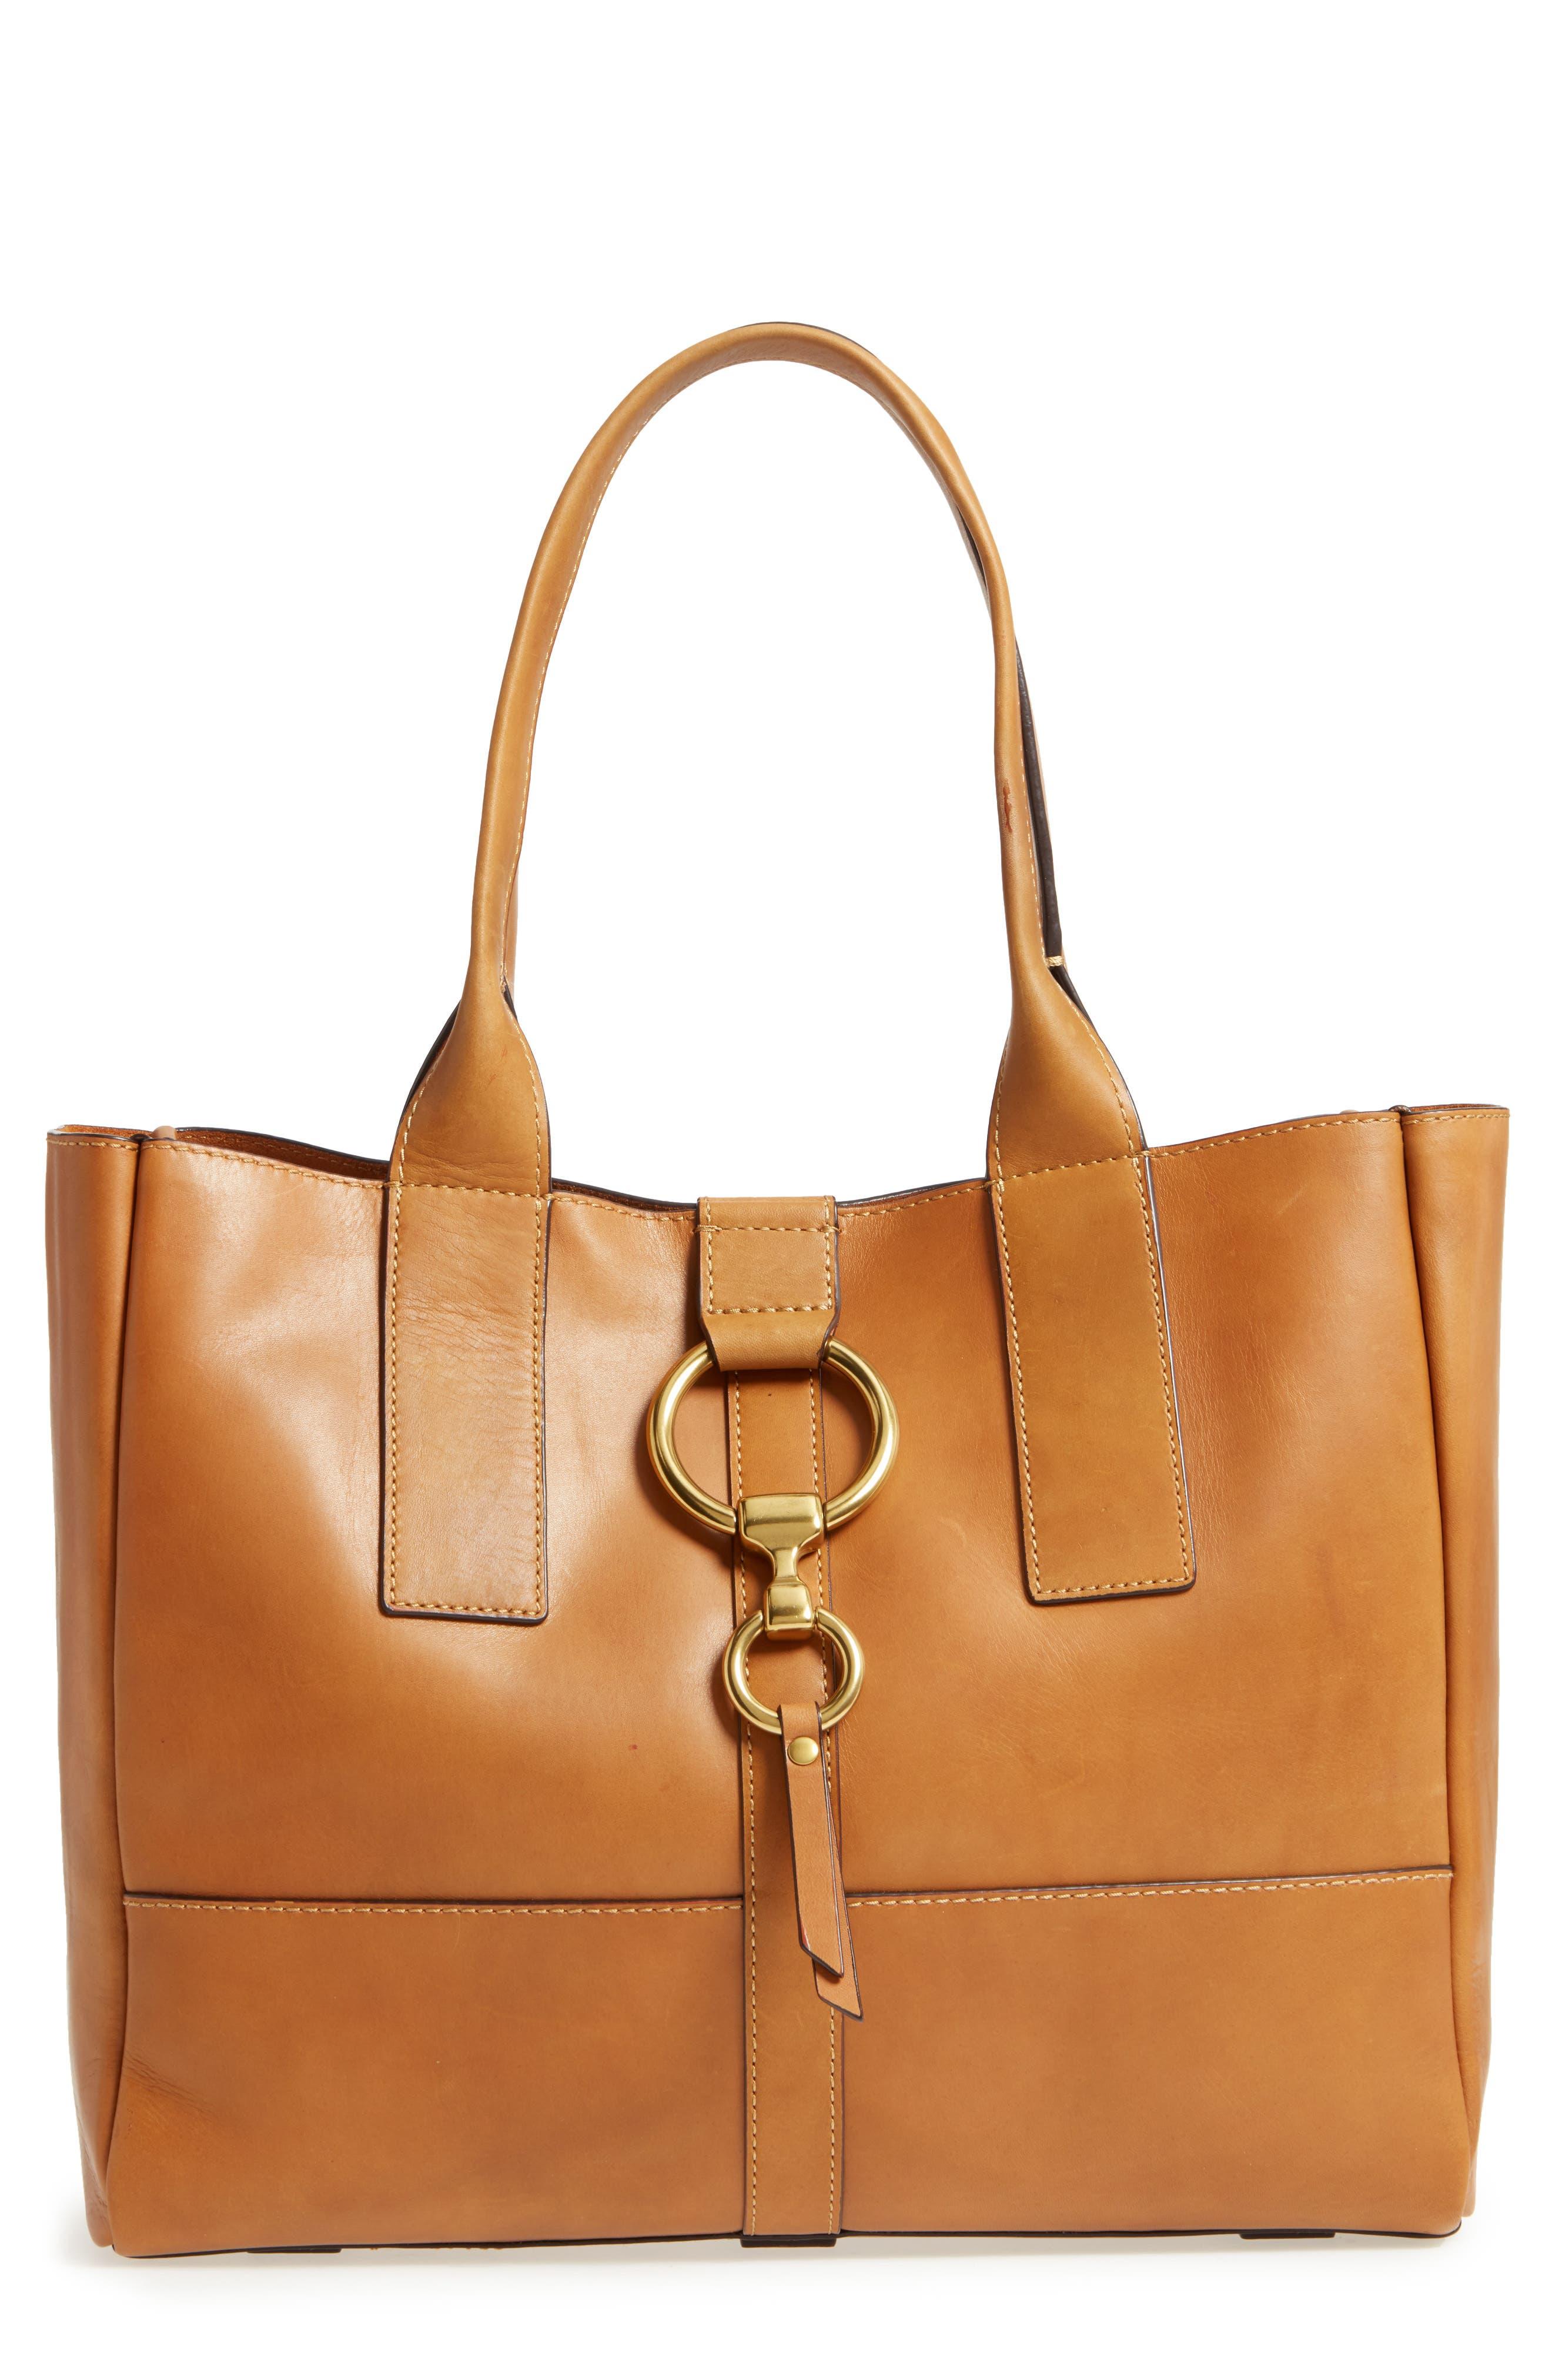 Ilana Harness Leather Shopper,                             Main thumbnail 1, color,                             Cognac